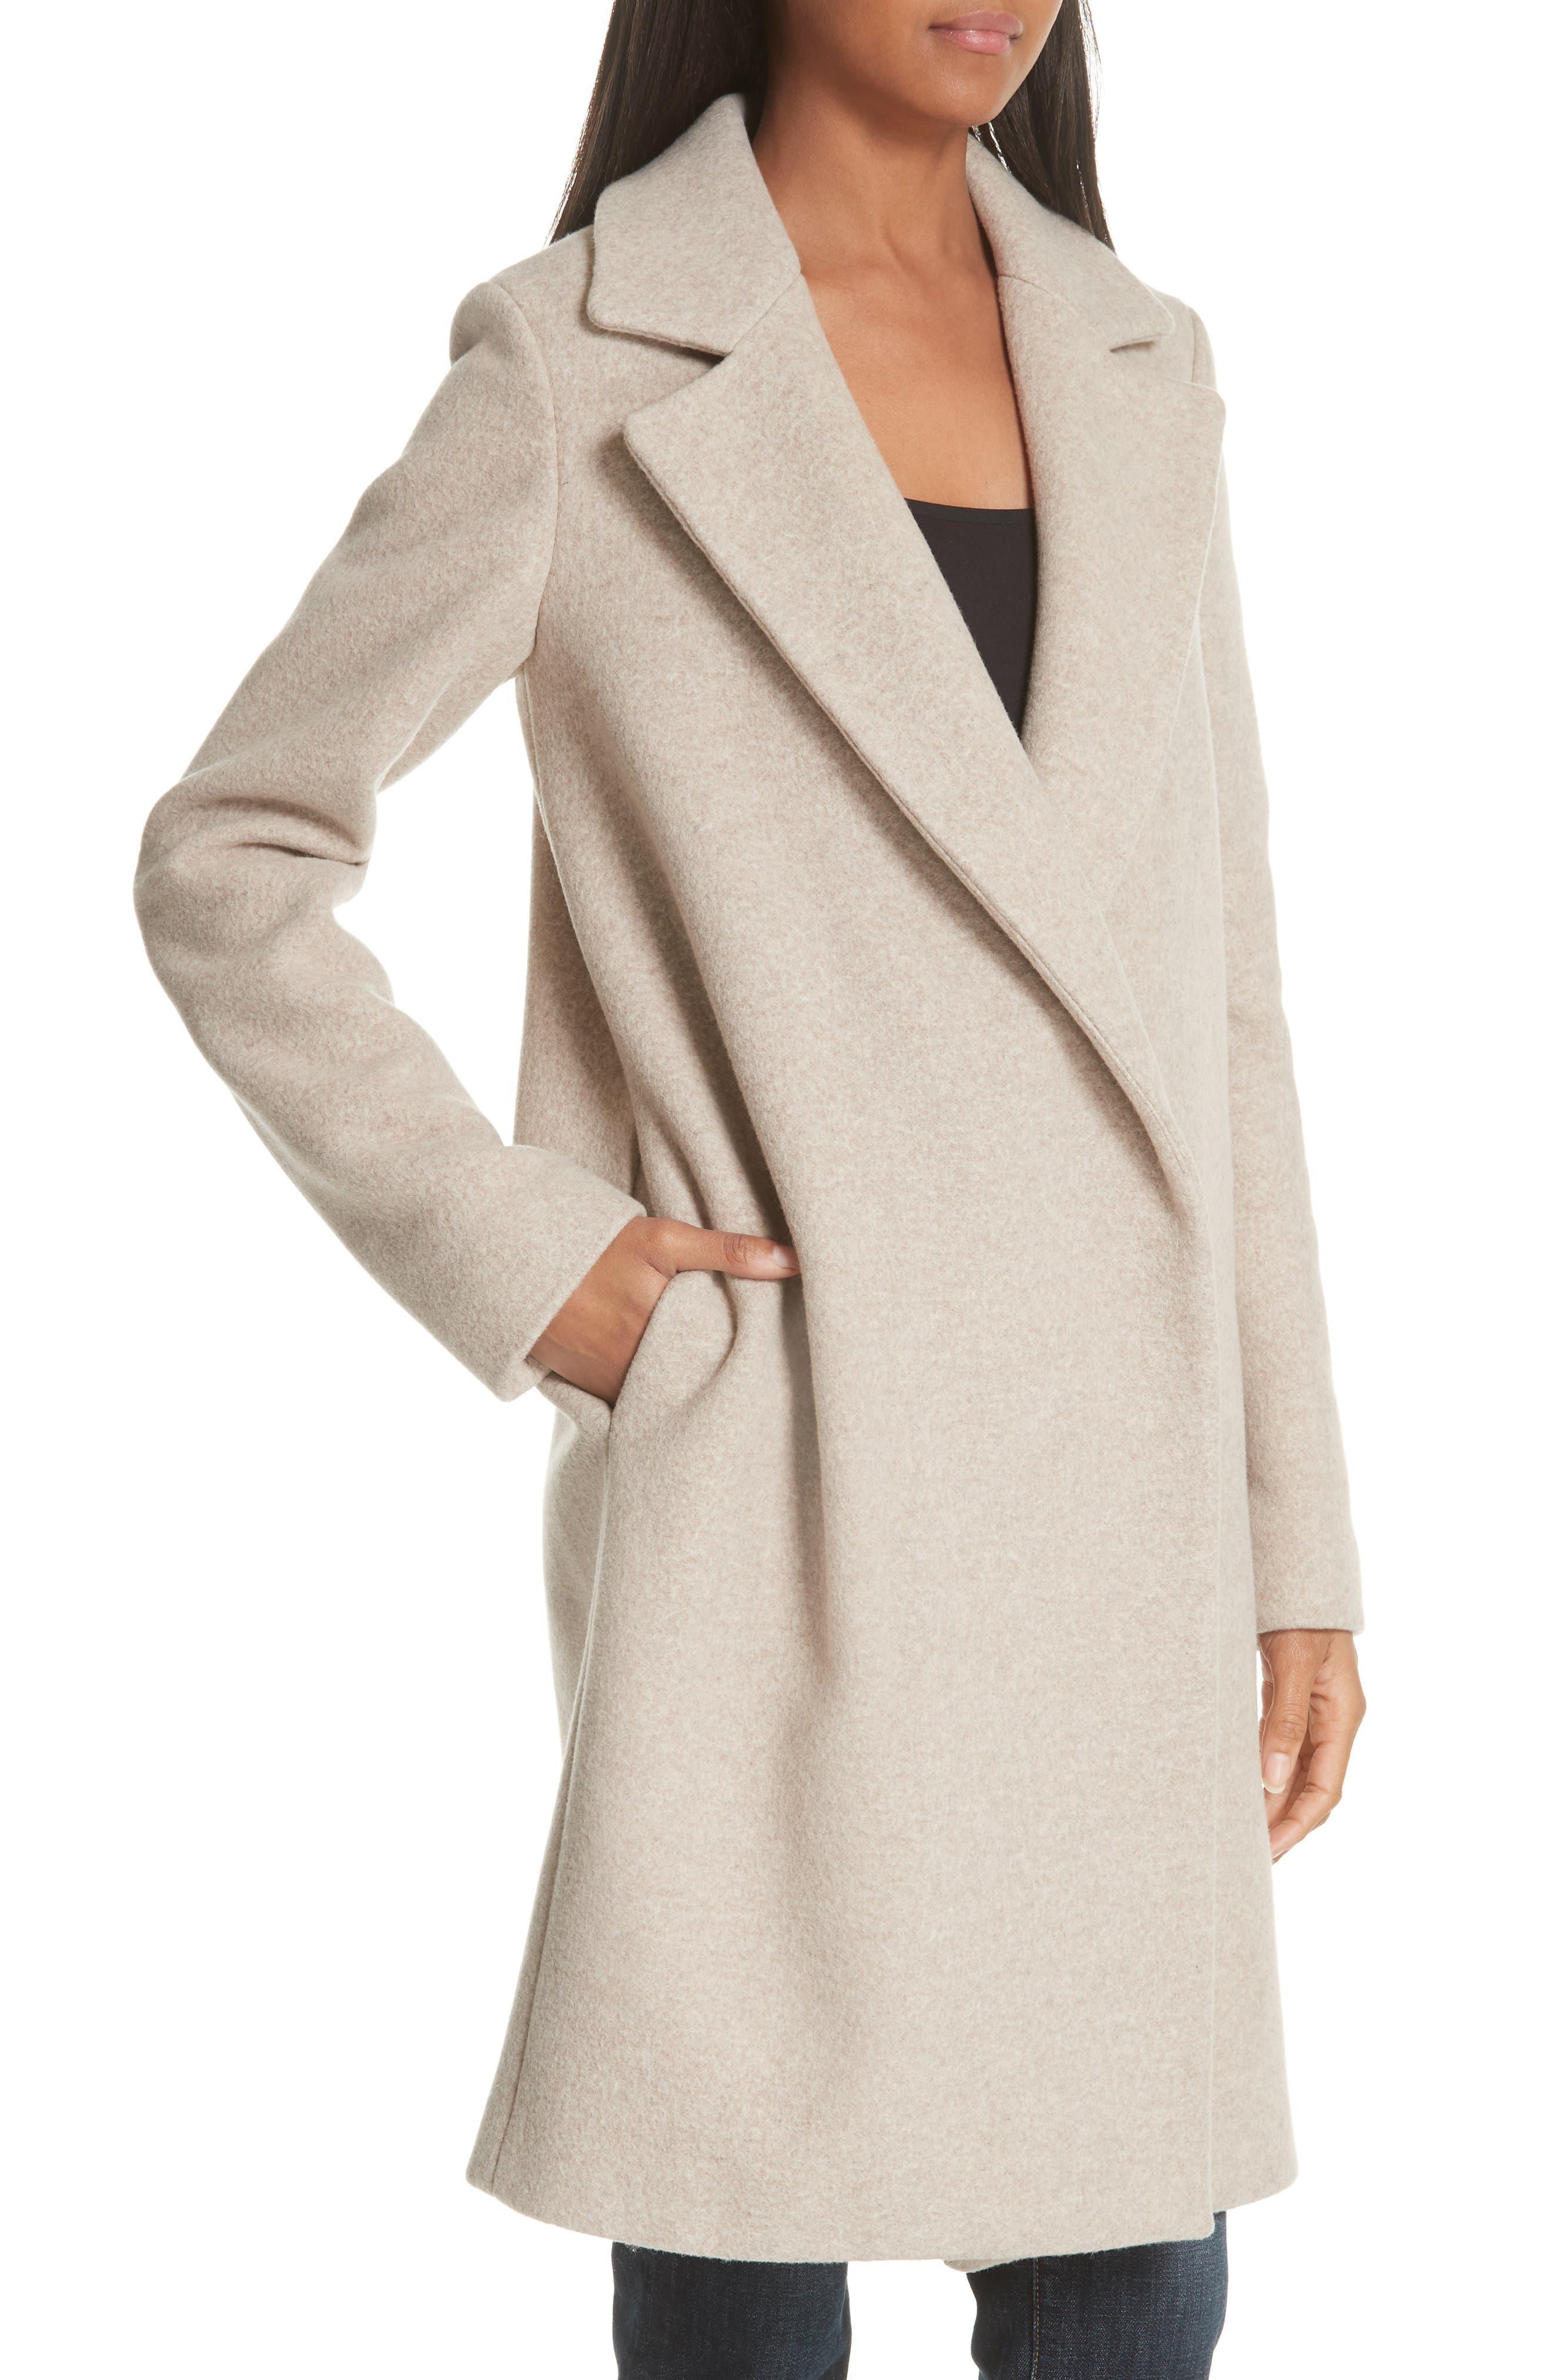 Clairene Hawthorne Wool Cashmere Coat,                             Alternate thumbnail 4, color,                             260